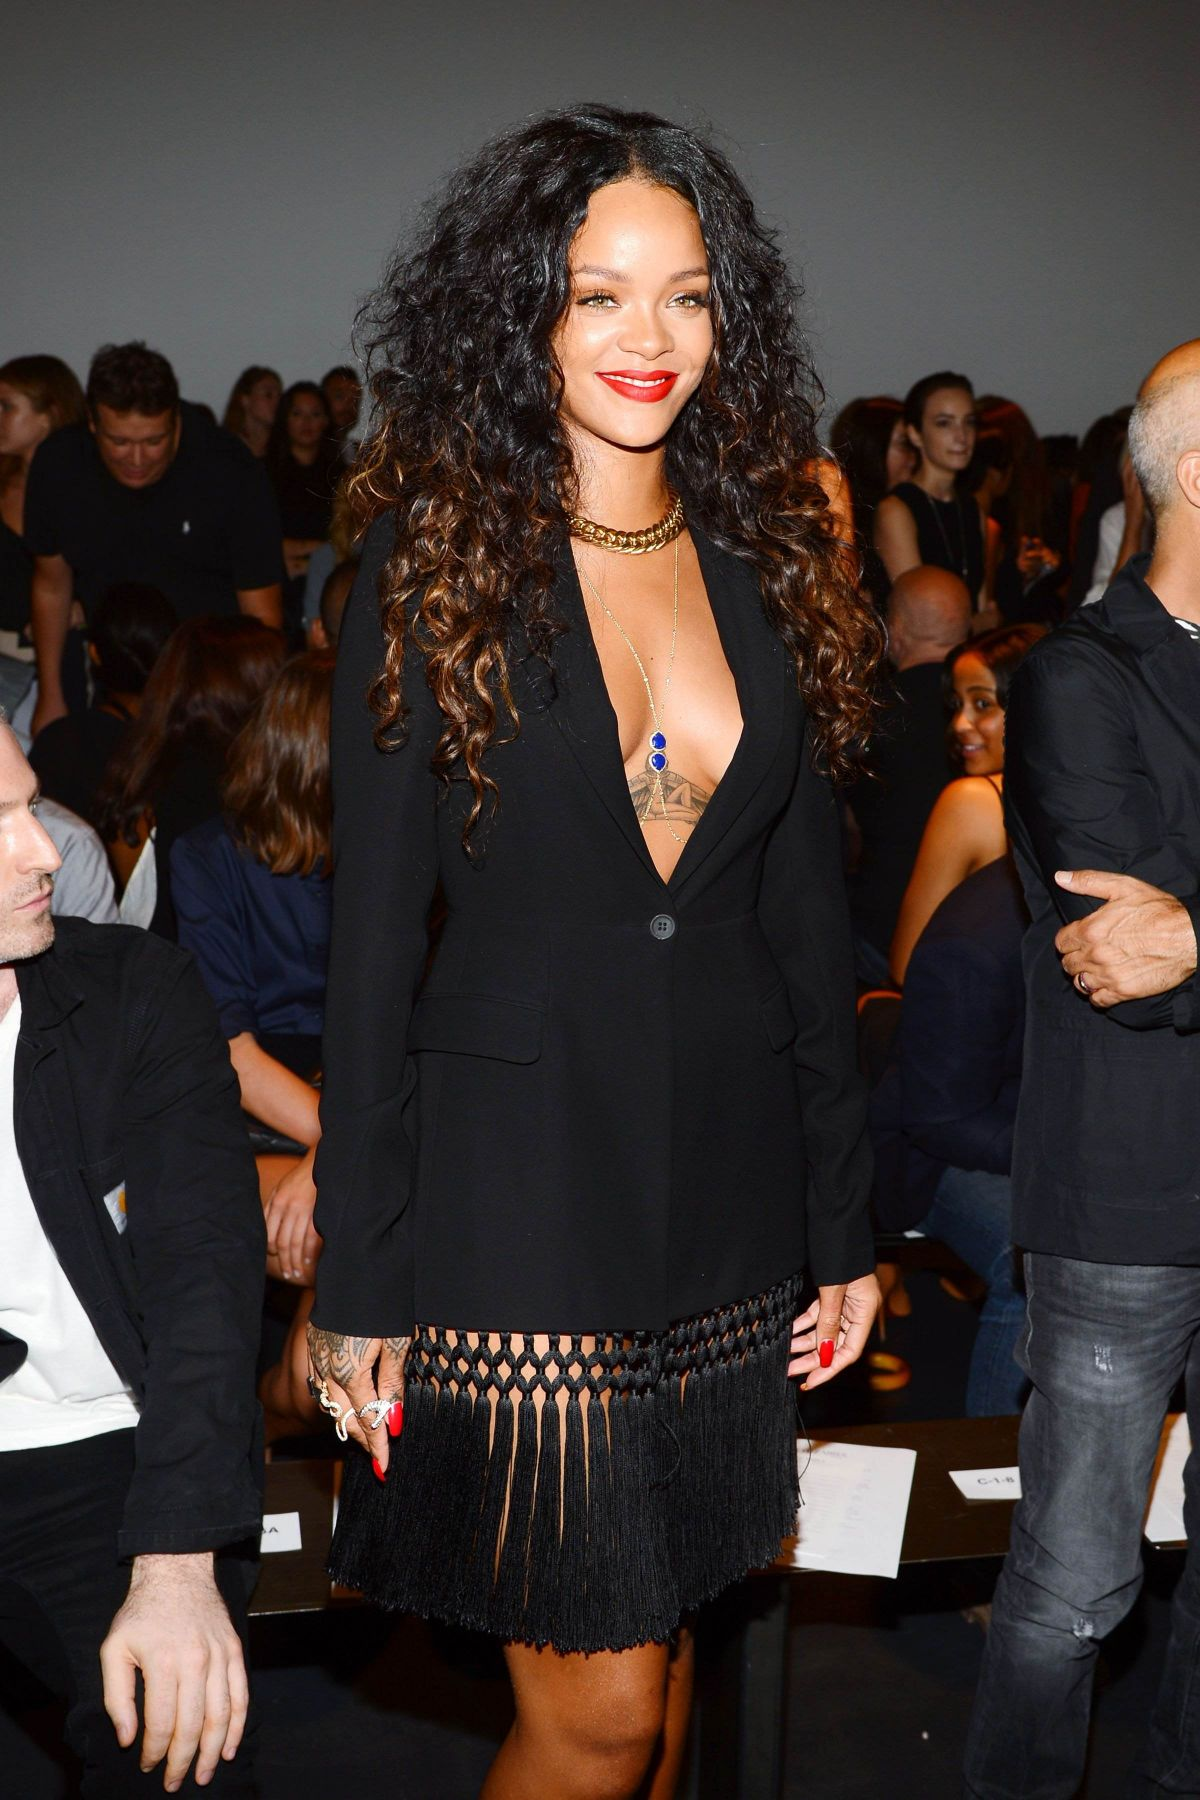 Rihanna At Altuzarra Fashion Show In New York Hawtcelebs Hawtcelebs